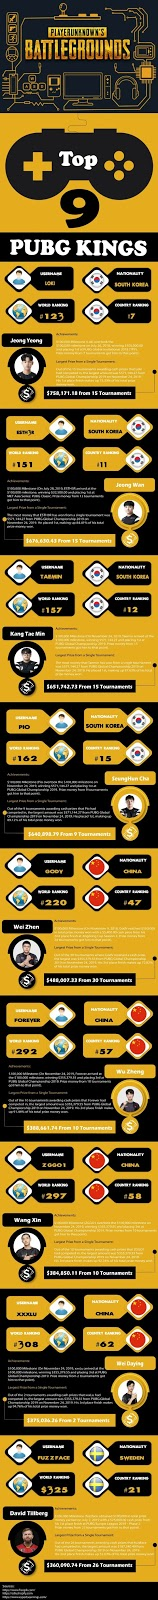 Top 9 খেলোয়ার PUBG থেকে আয়    Top 9 PUBG Player Earning